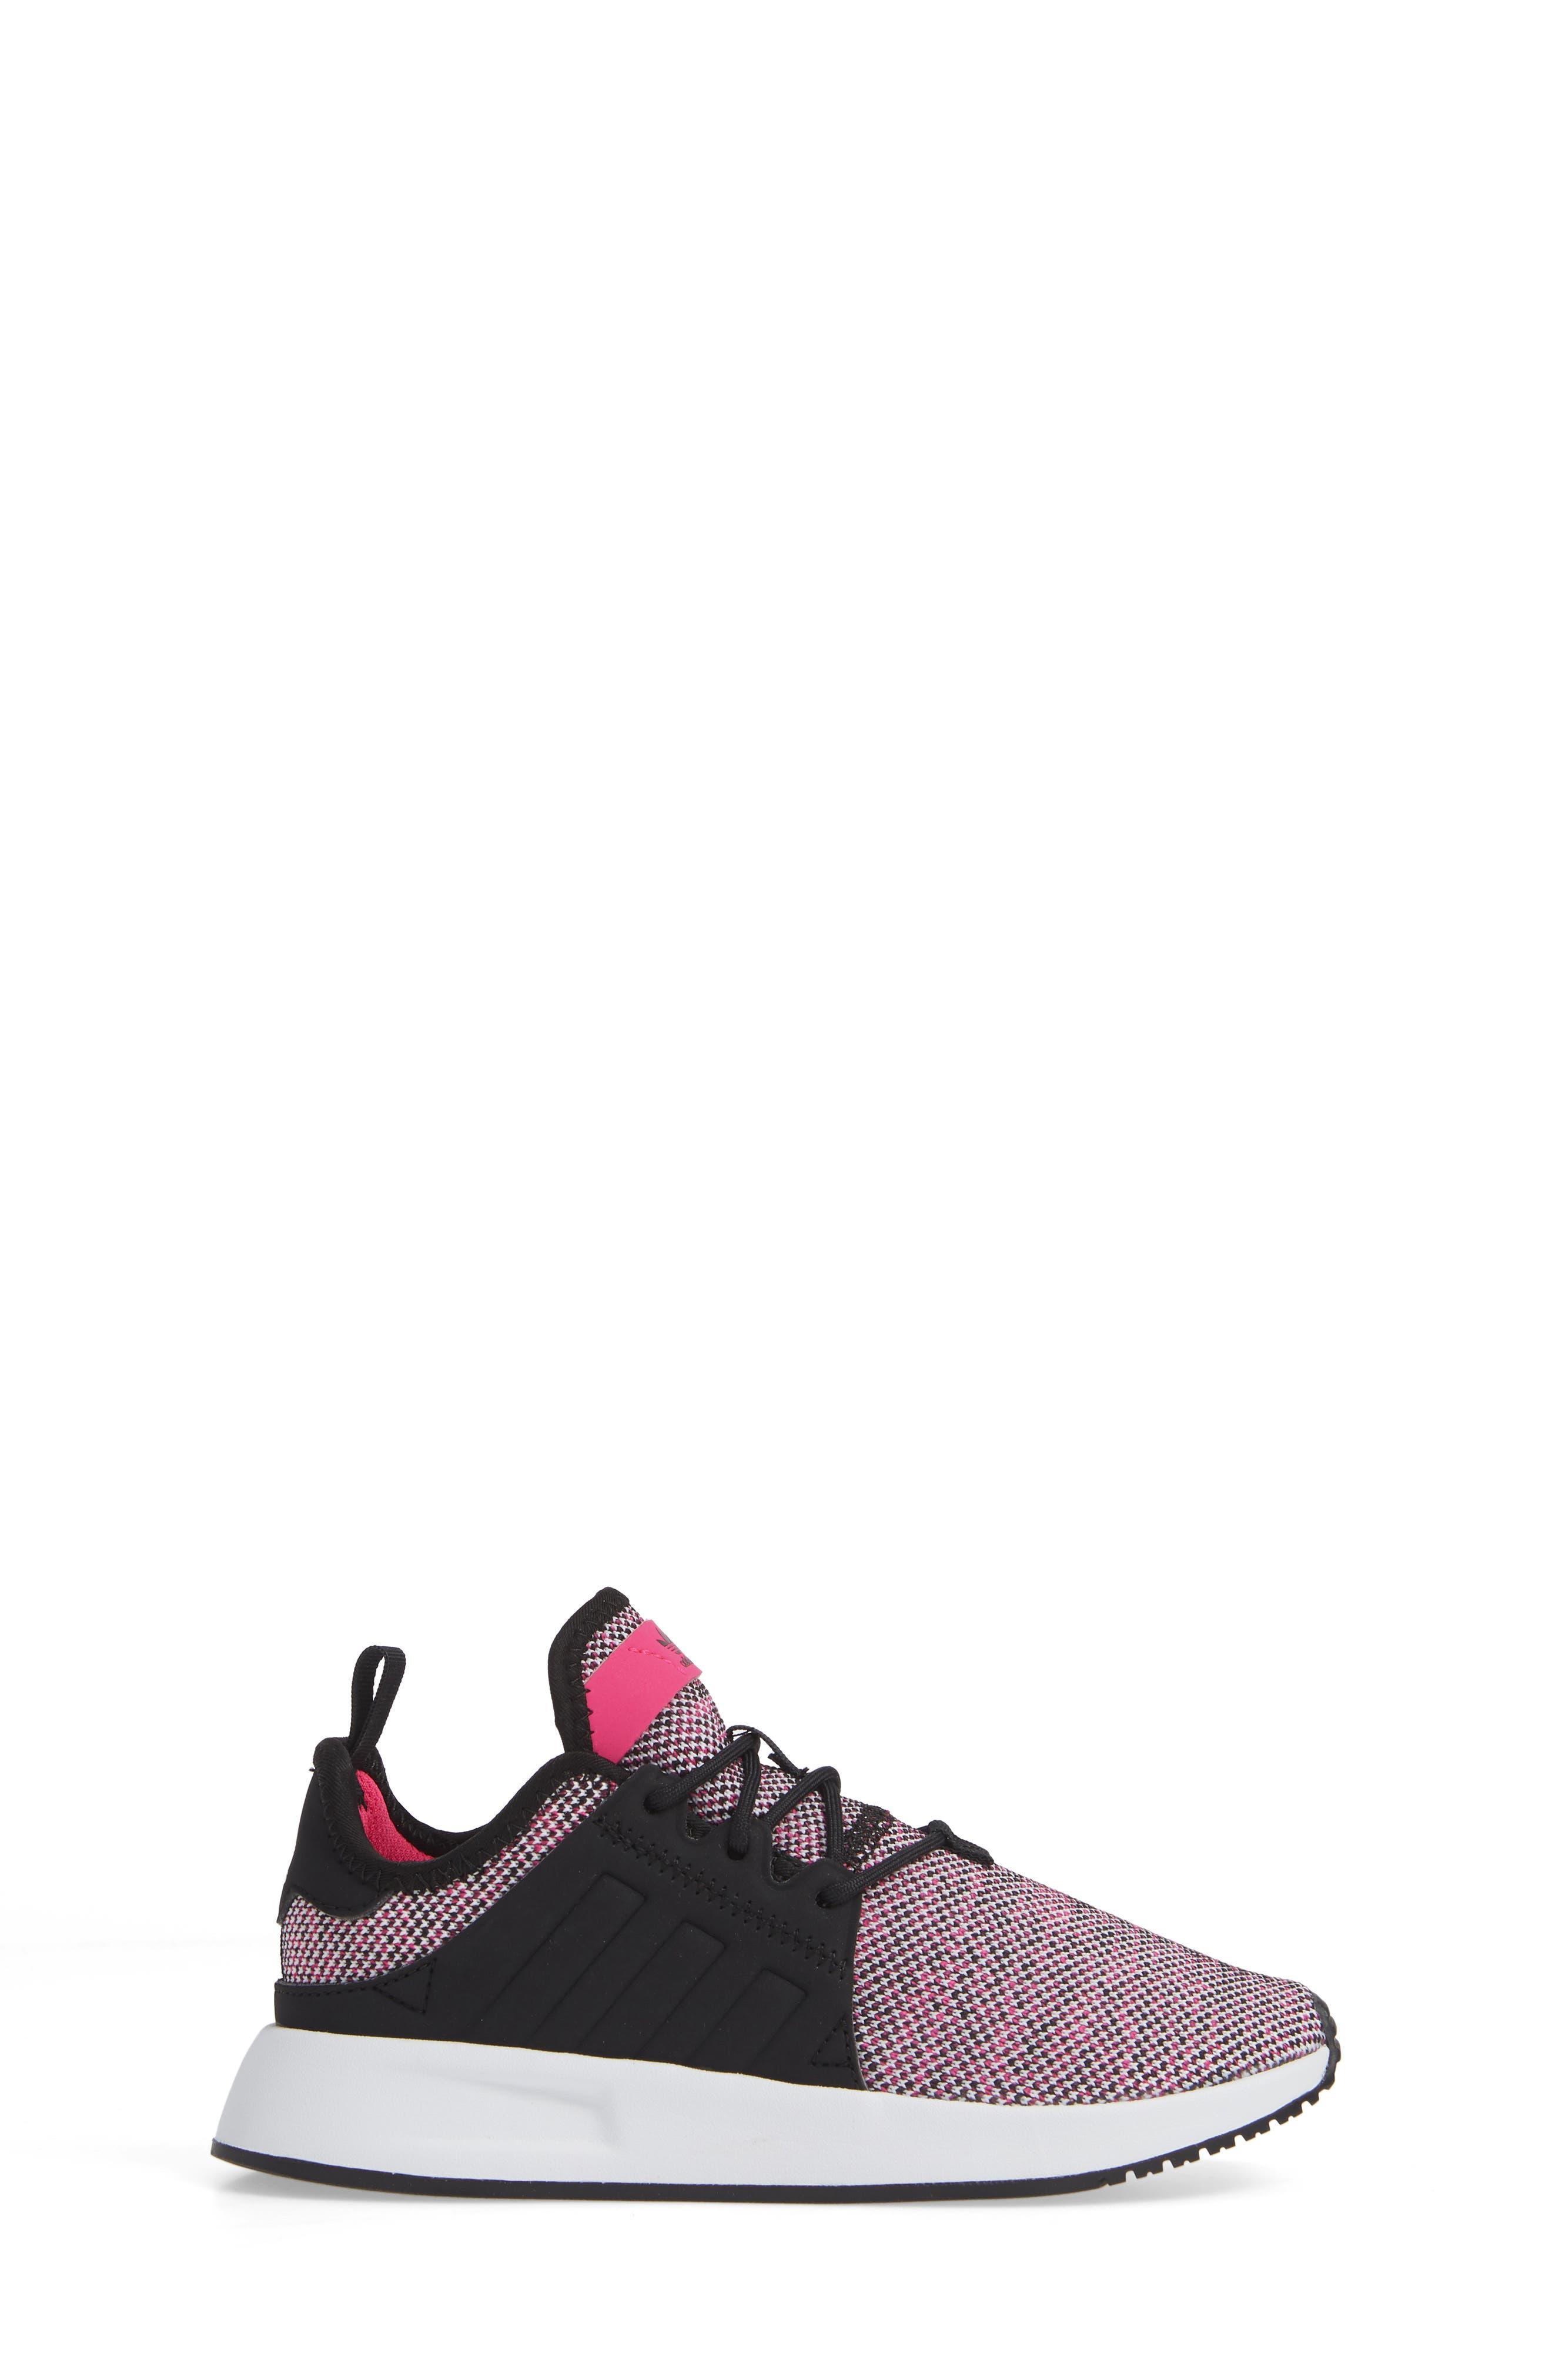 X_PLR Sneaker,                             Alternate thumbnail 3, color,                             Shock Pink/ Black/ White